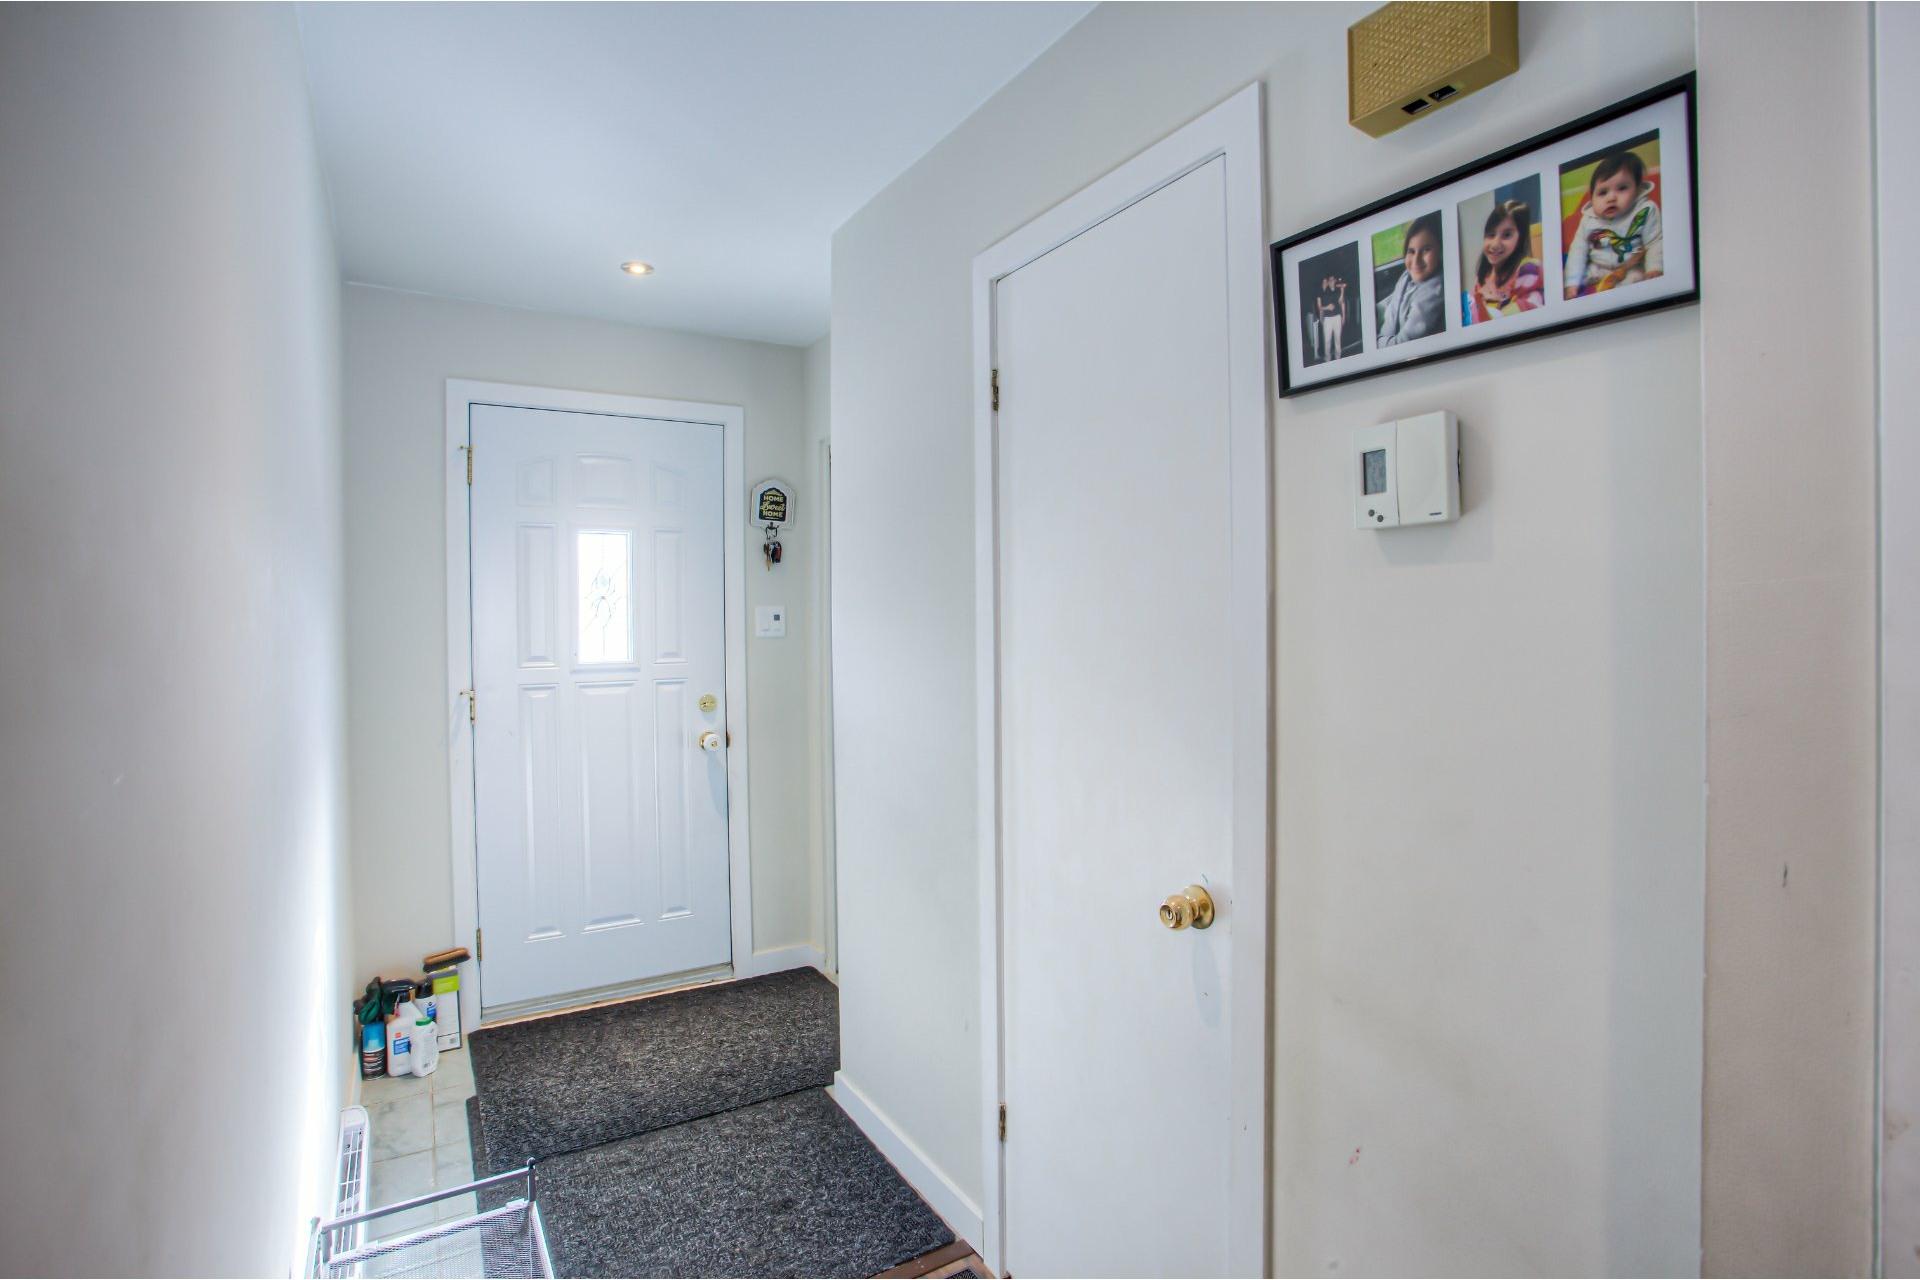 image 2 - House For rent Pierrefonds-Roxboro Montréal  - 9 rooms